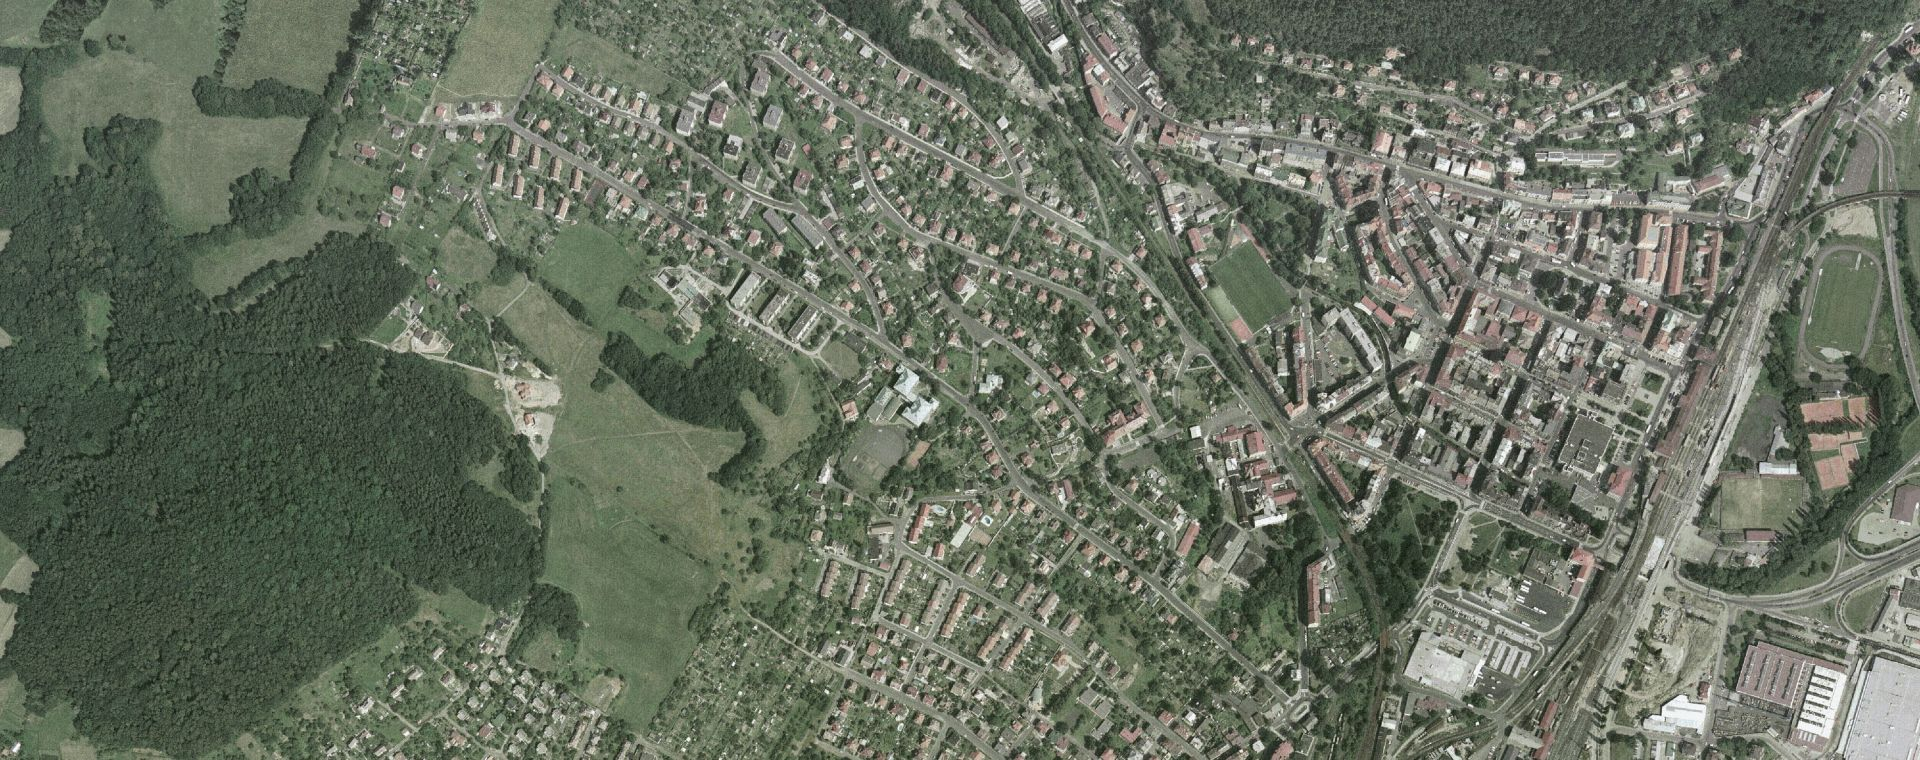 Urbanistická soutěž Děčín - Podmokly, 05/2013, Ústecký kraj, CZ